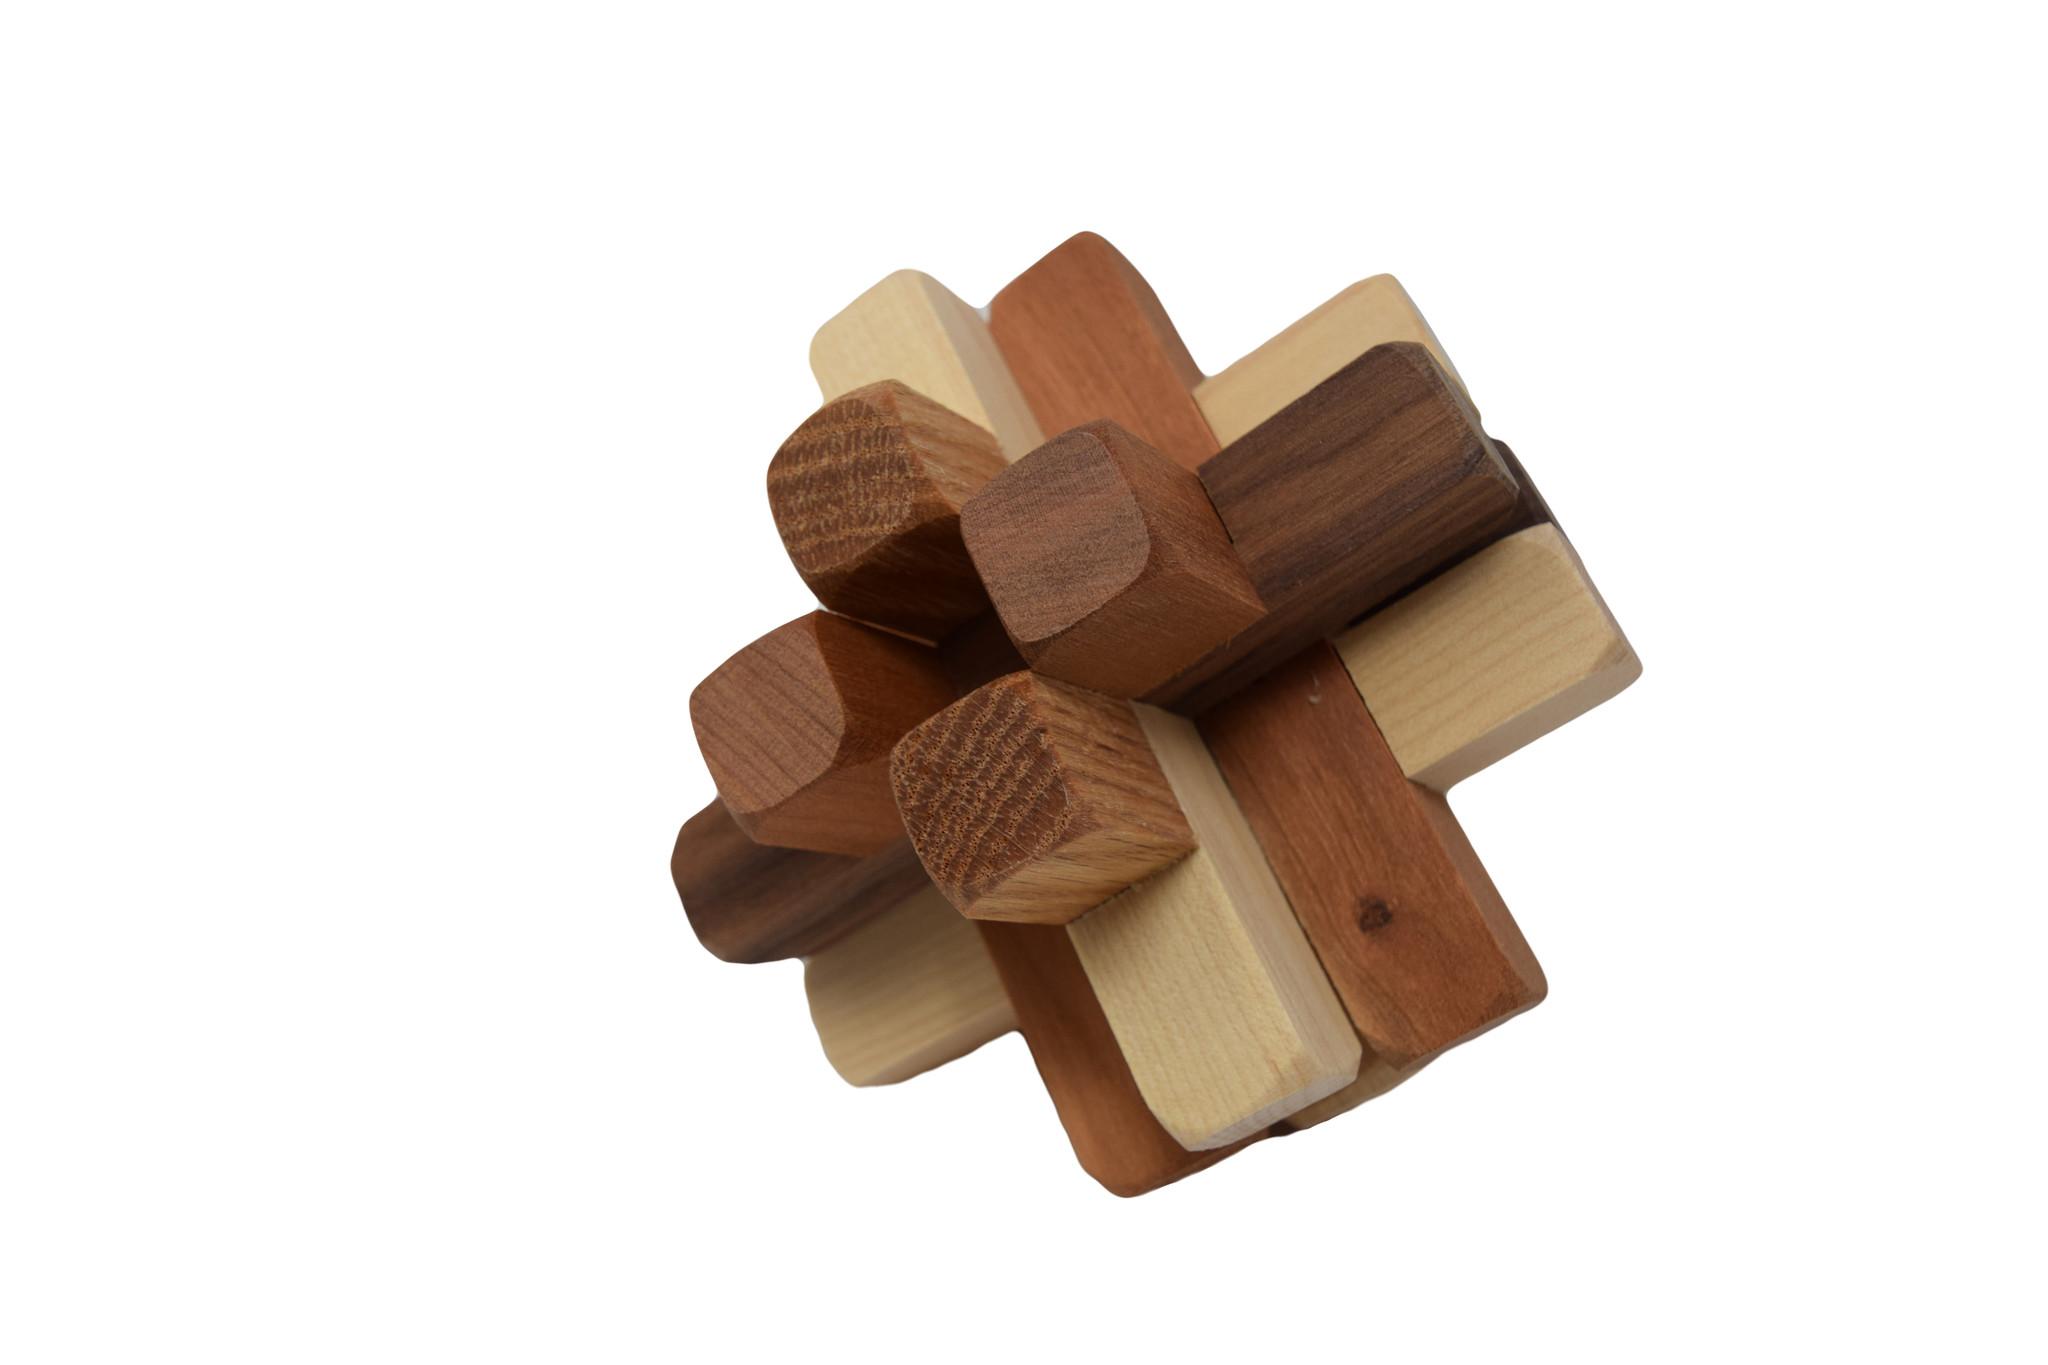 12 Piece Puzzle-1